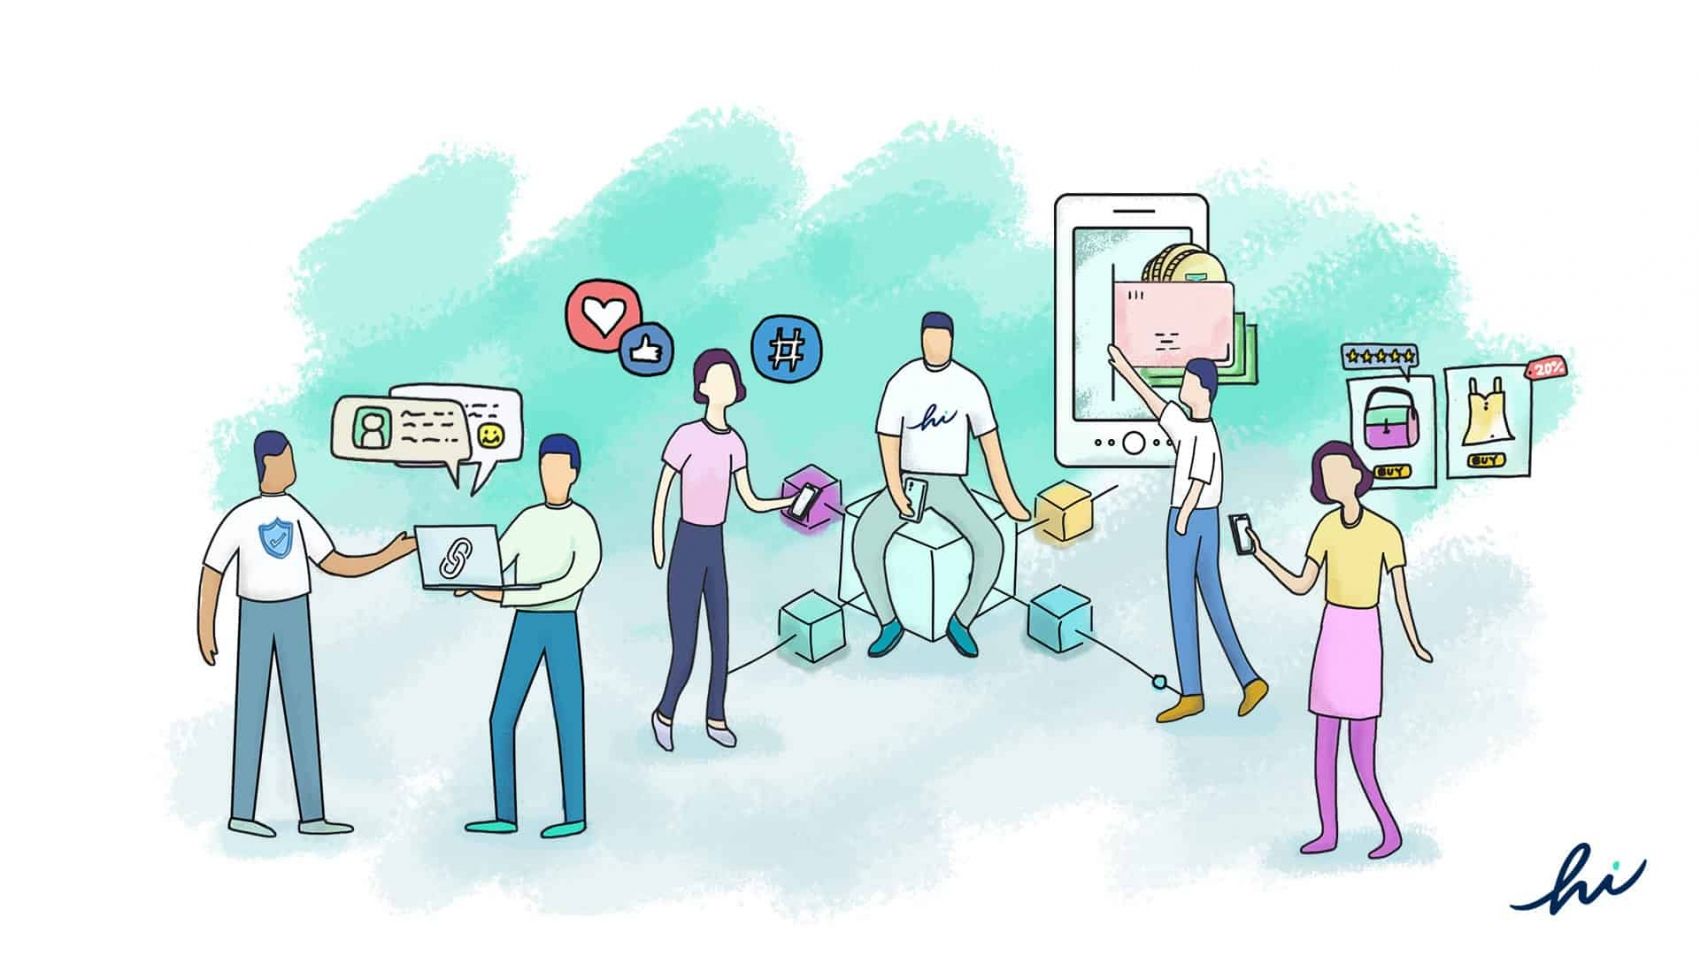 GenZ using fully digital financial services